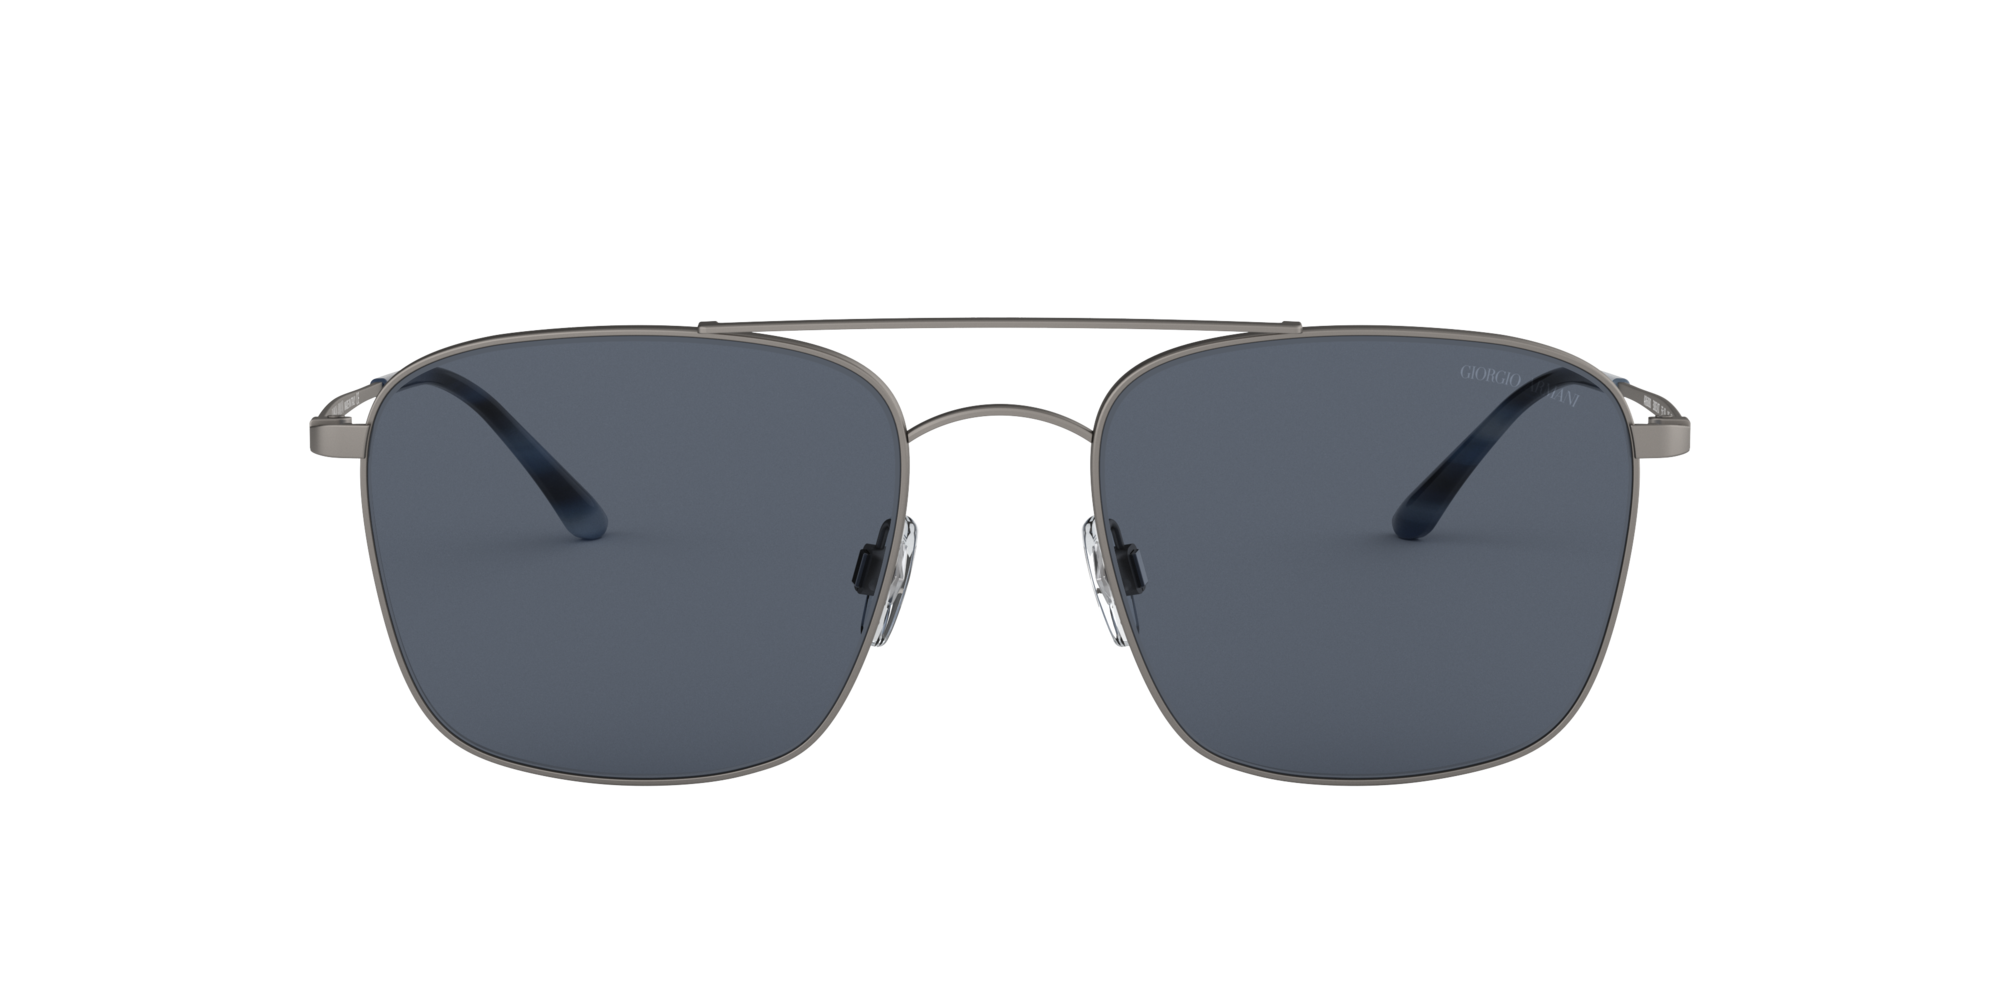 Image for AR6080 55 from LensCrafters   Glasses, Prescription Glasses Online, Eyewear